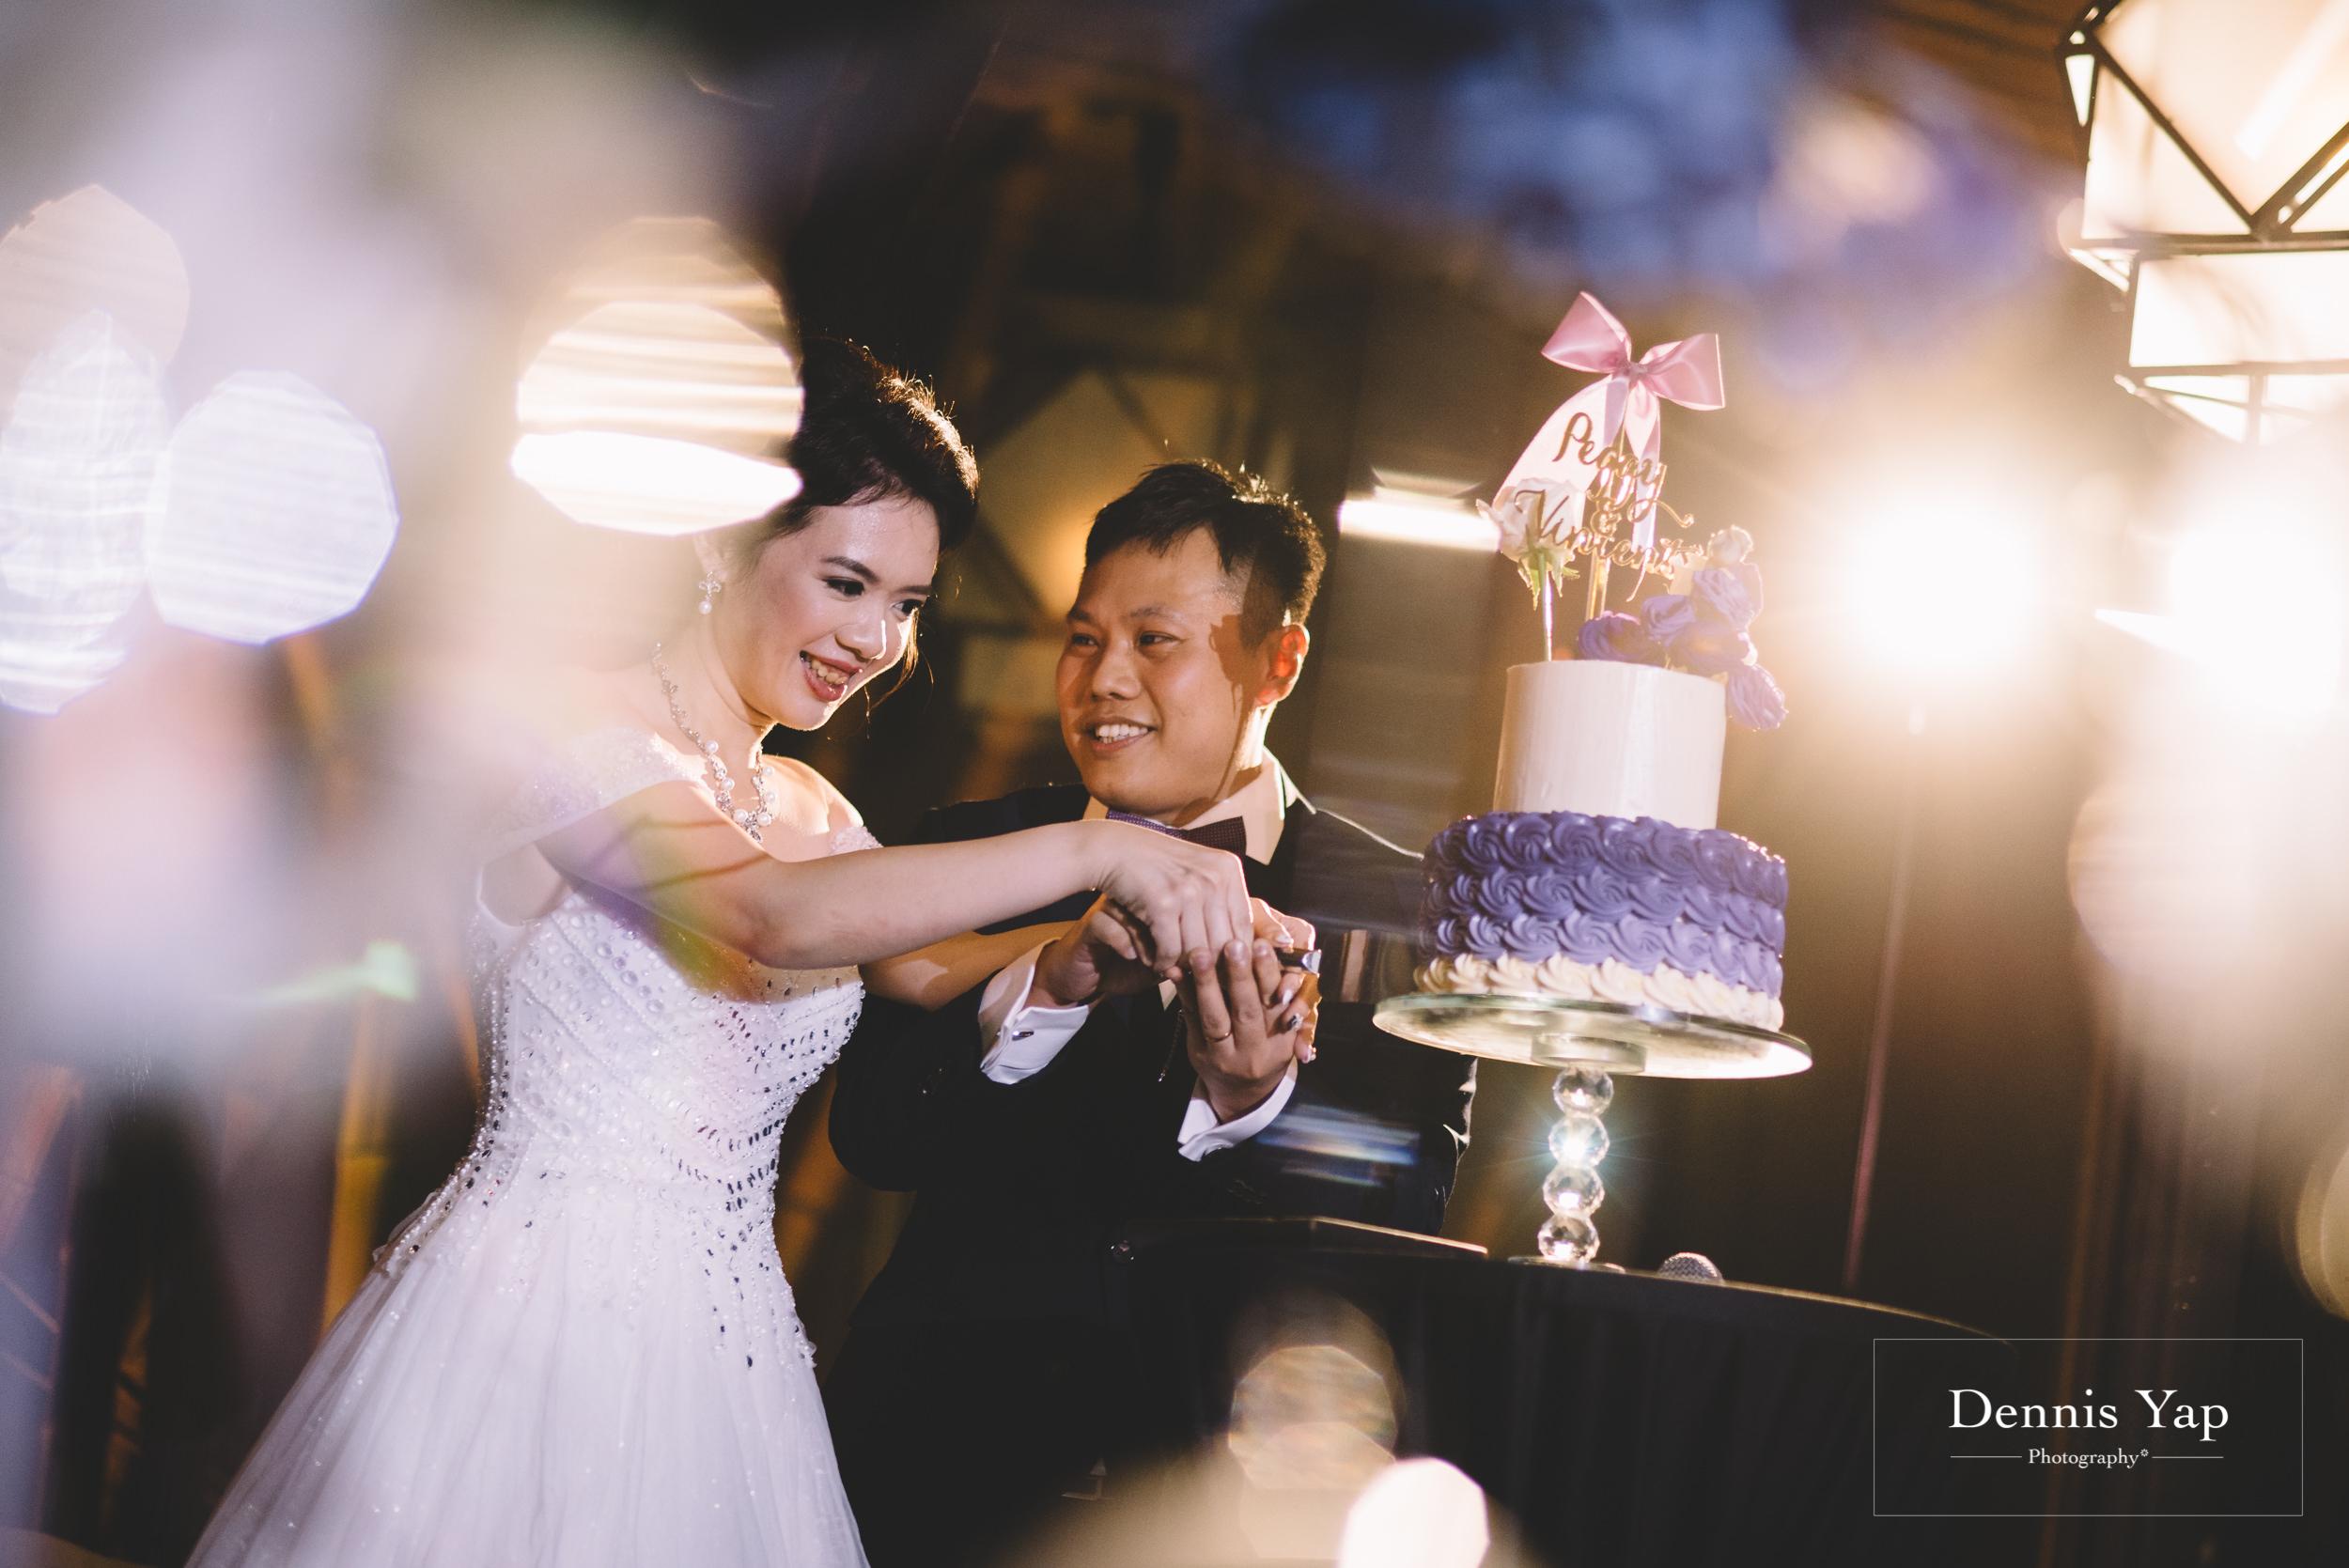 vincent peggy wedding dinner neo tamarind kuala lumpur dennis yap photography-27.jpg